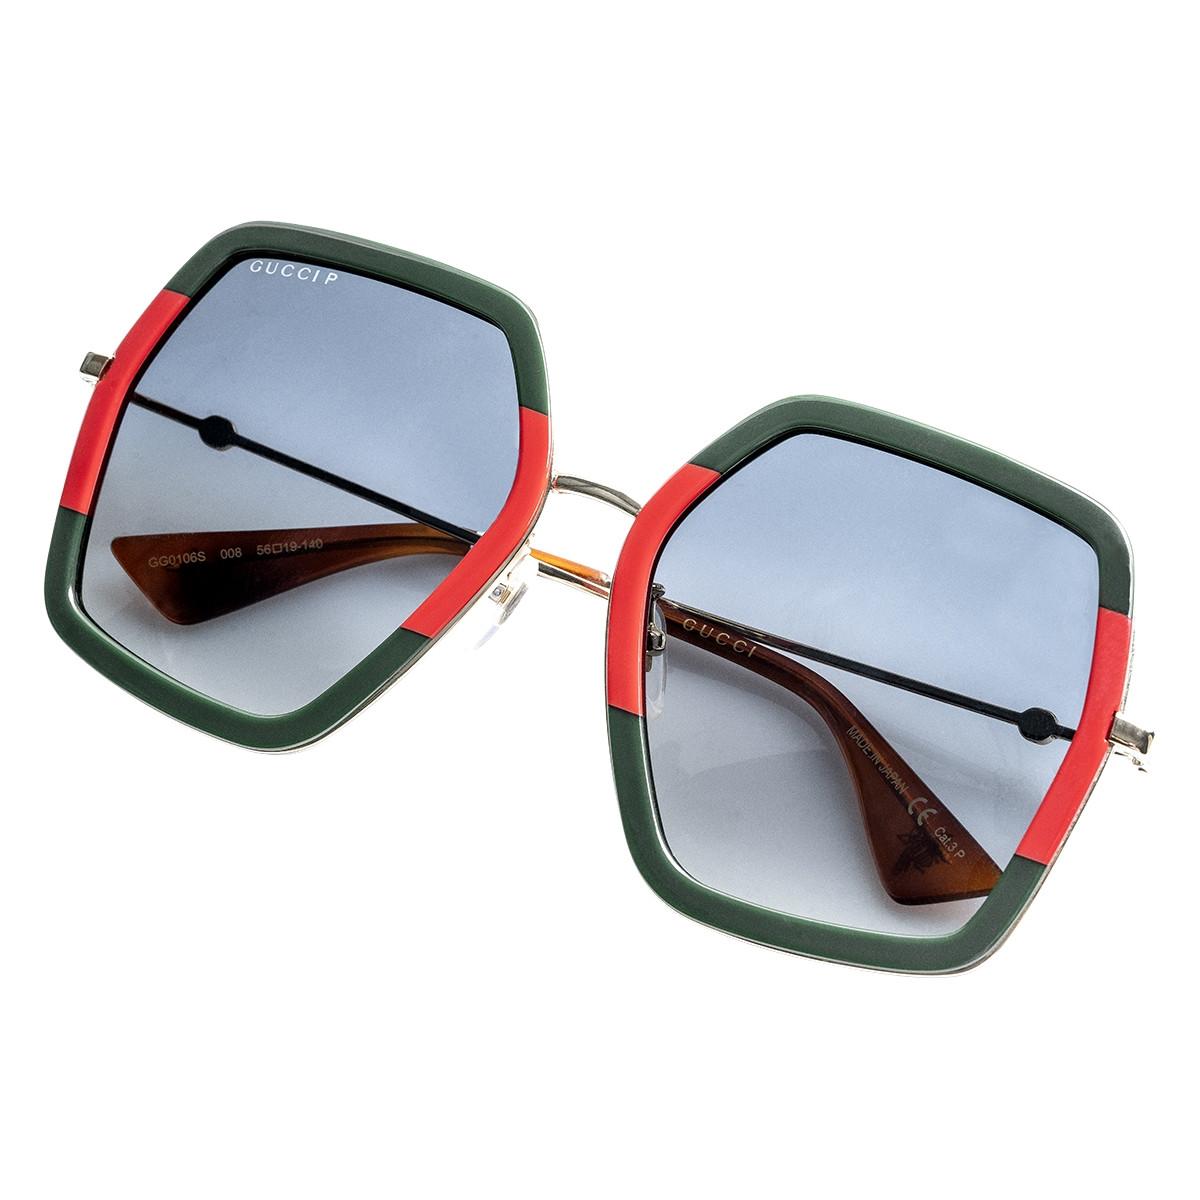 Vintage Gucci Wire Frame Sunglasses